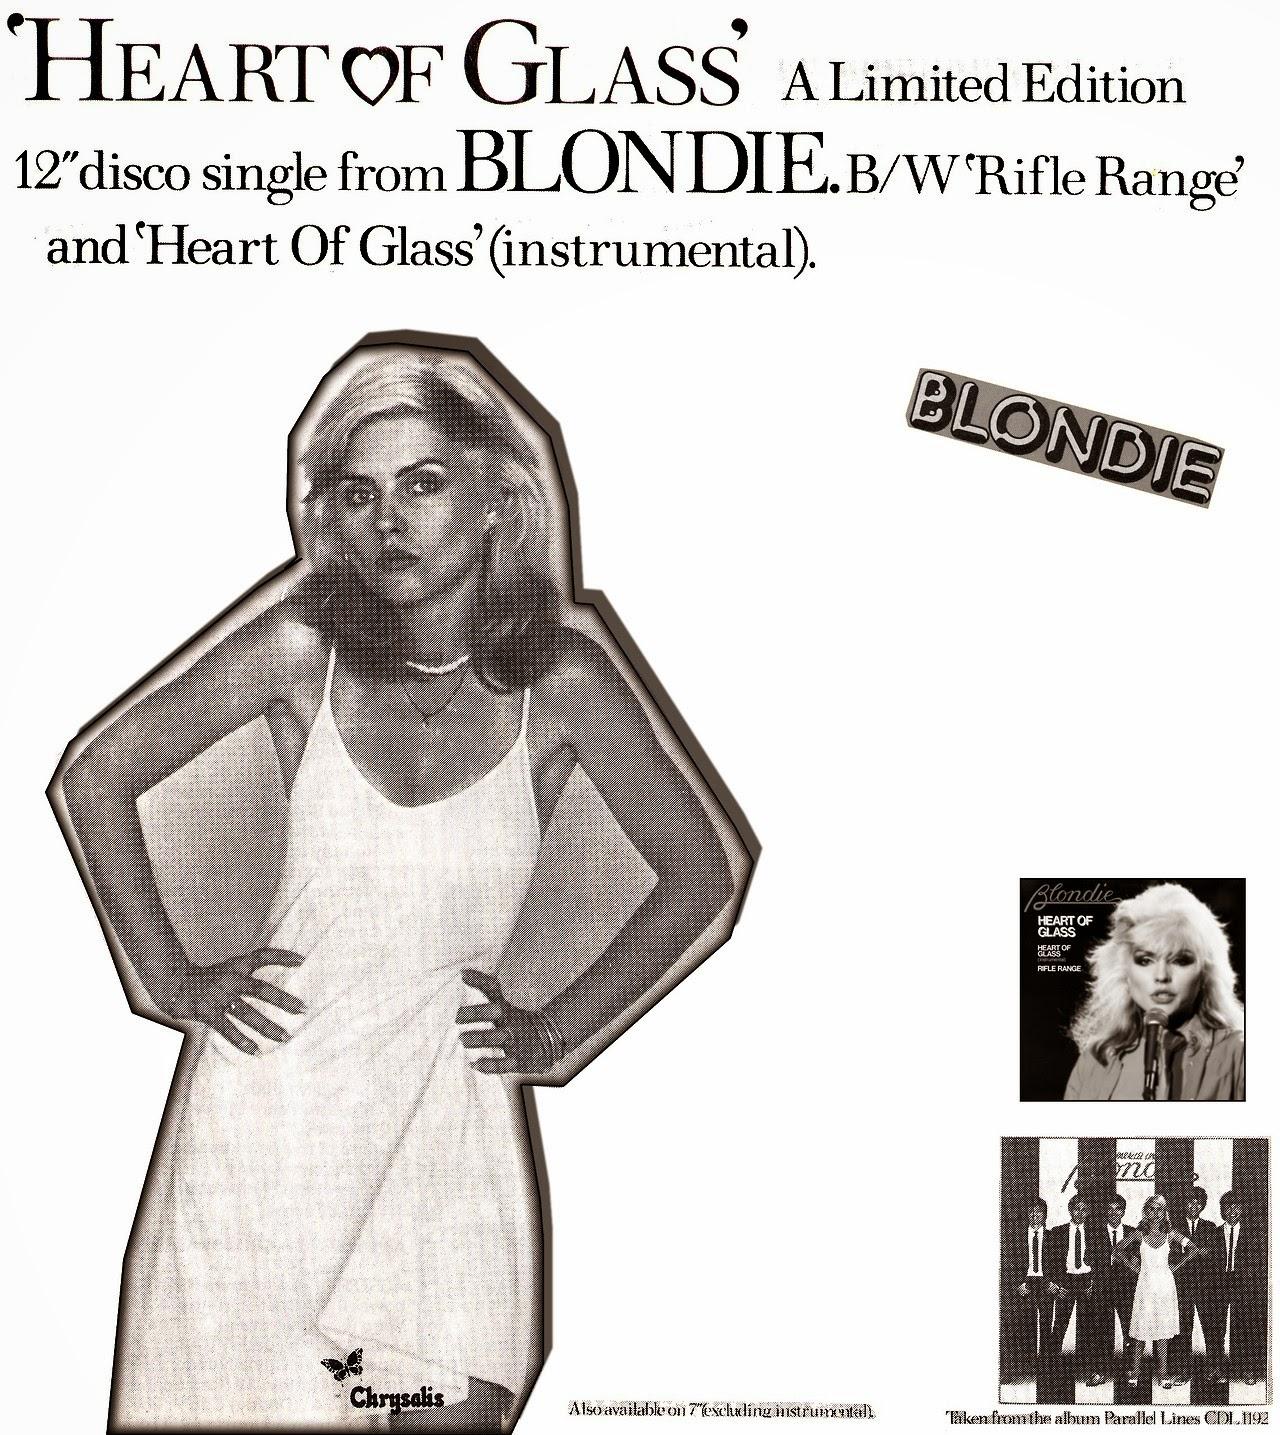 RECORTES DE PRENSA - Página 8 Blondie,+%E2%80%98Heart+of+Glass%E2%80%99+12%E2%80%9D+disco+mix+promo+advertisement,+1979